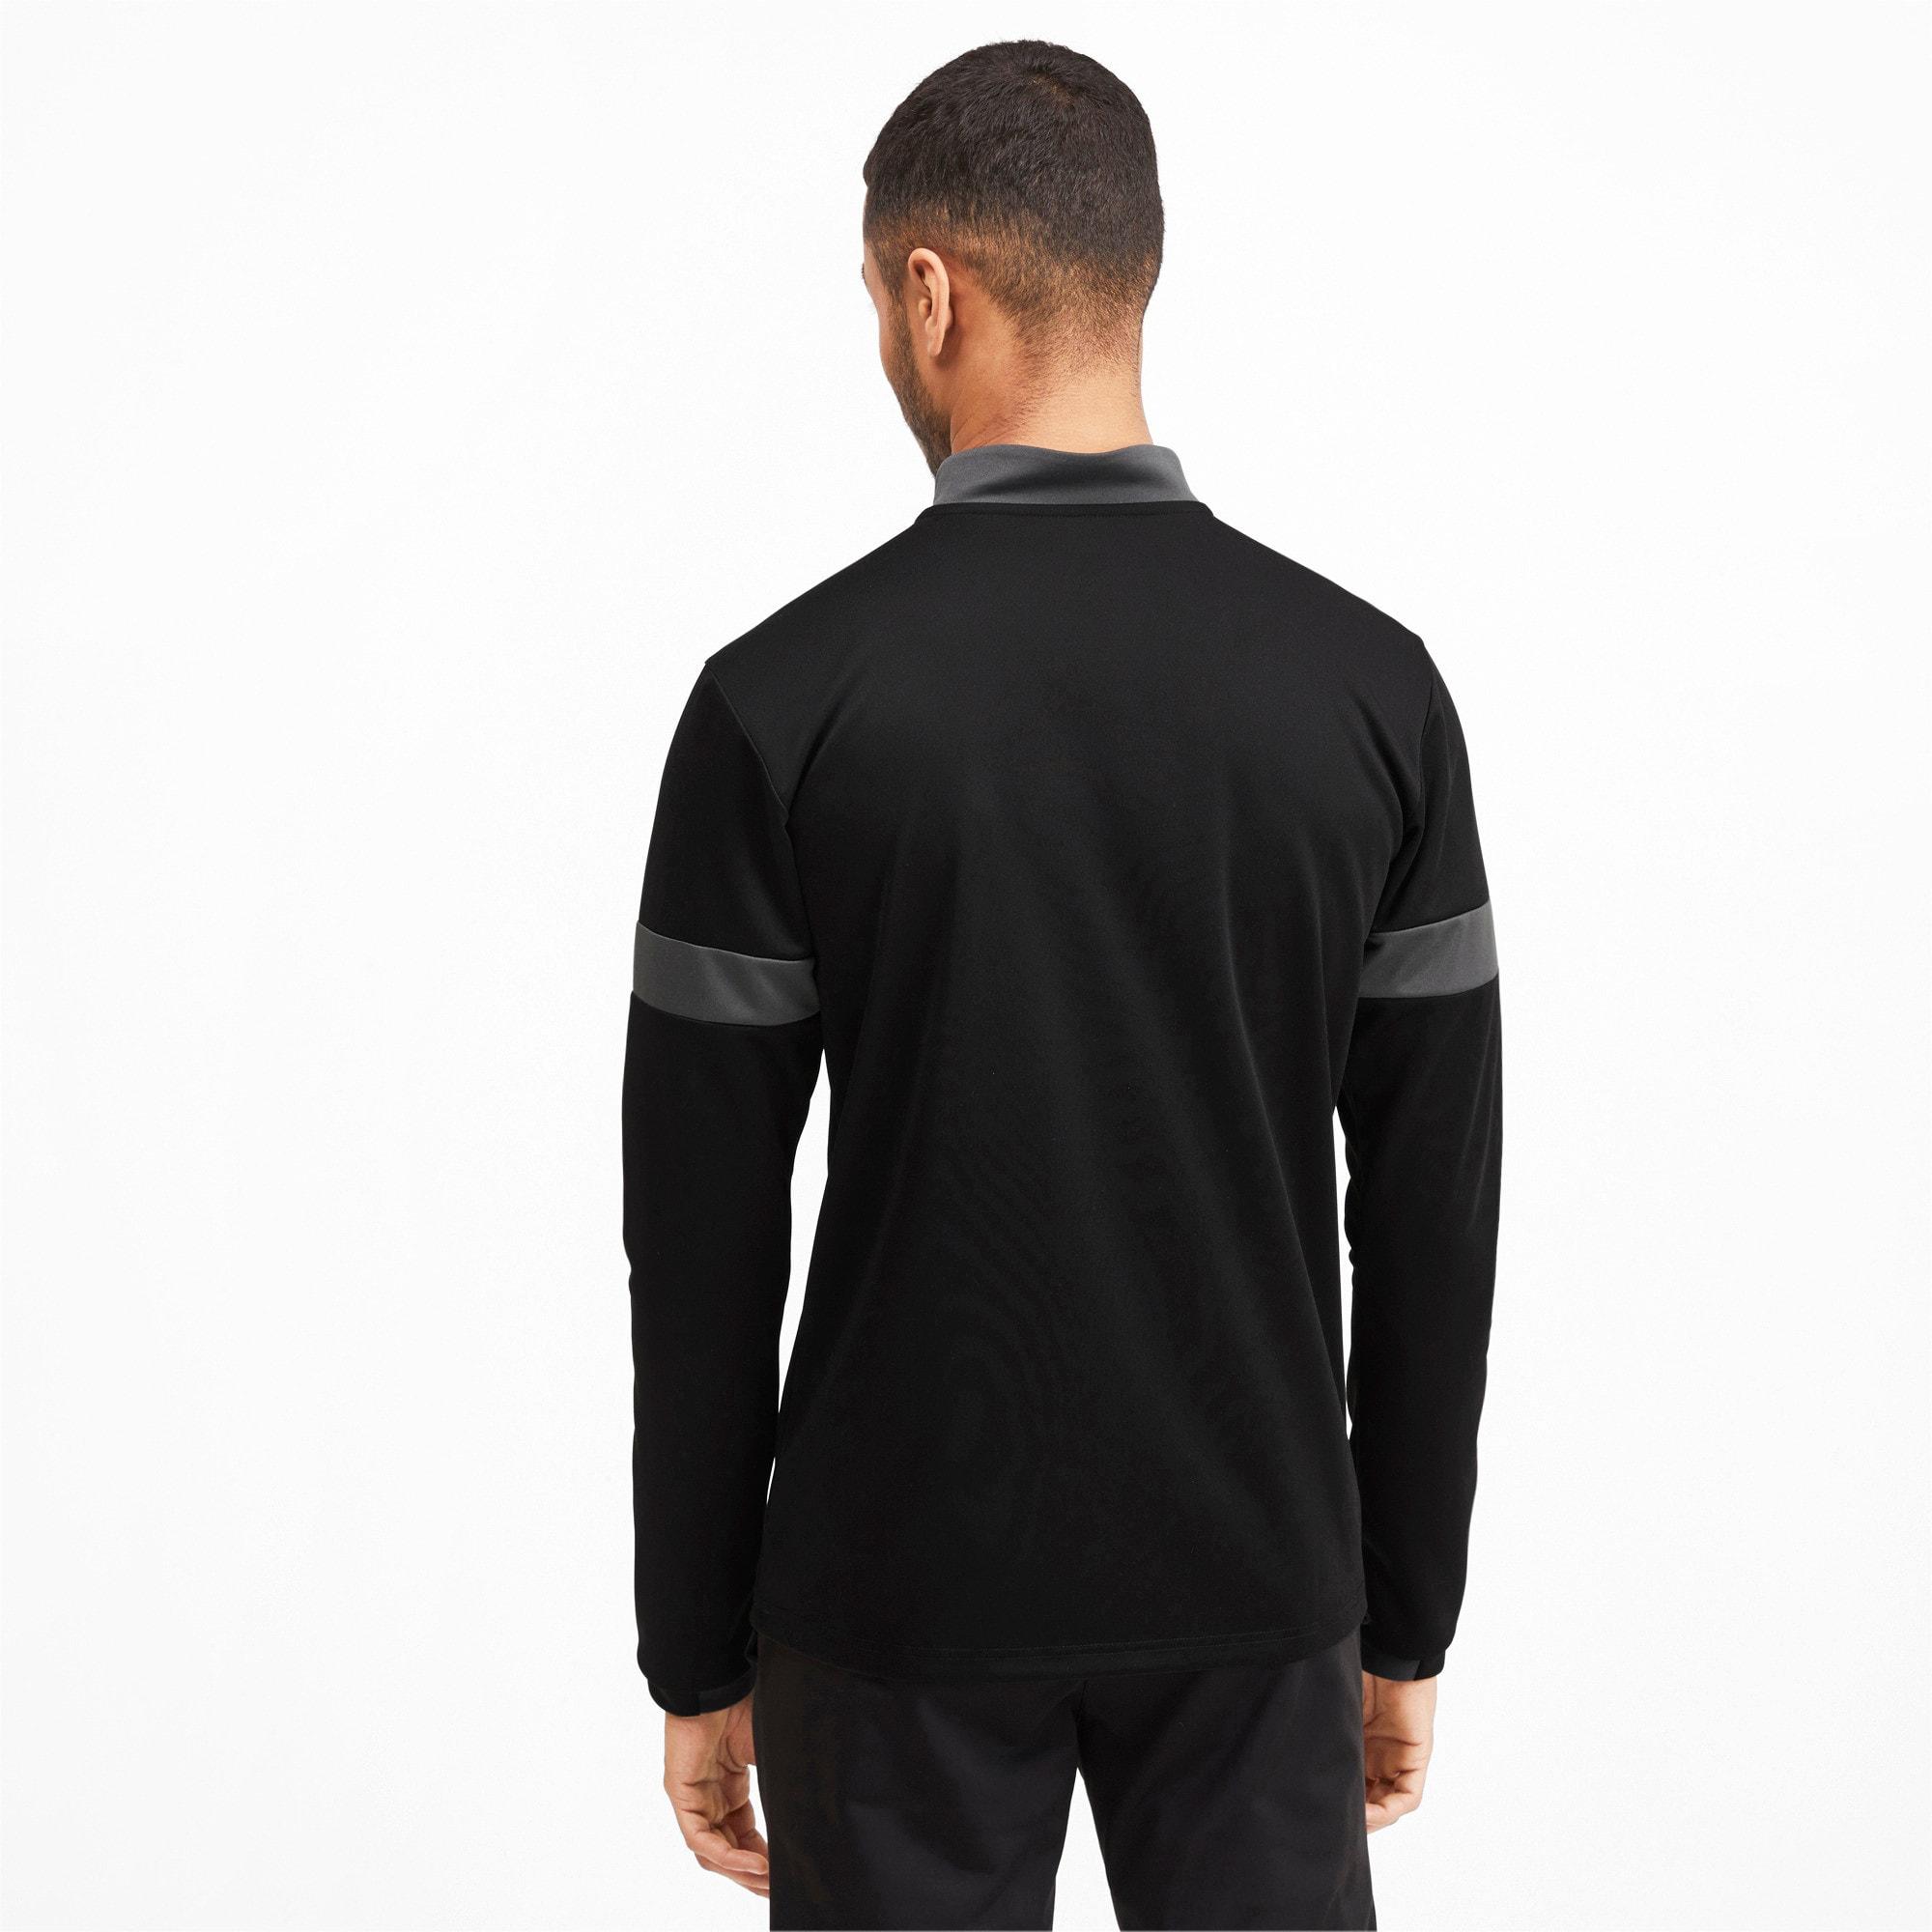 Thumbnail 2 of Sweatshirt pour homme, Puma Black-Asphalt, medium